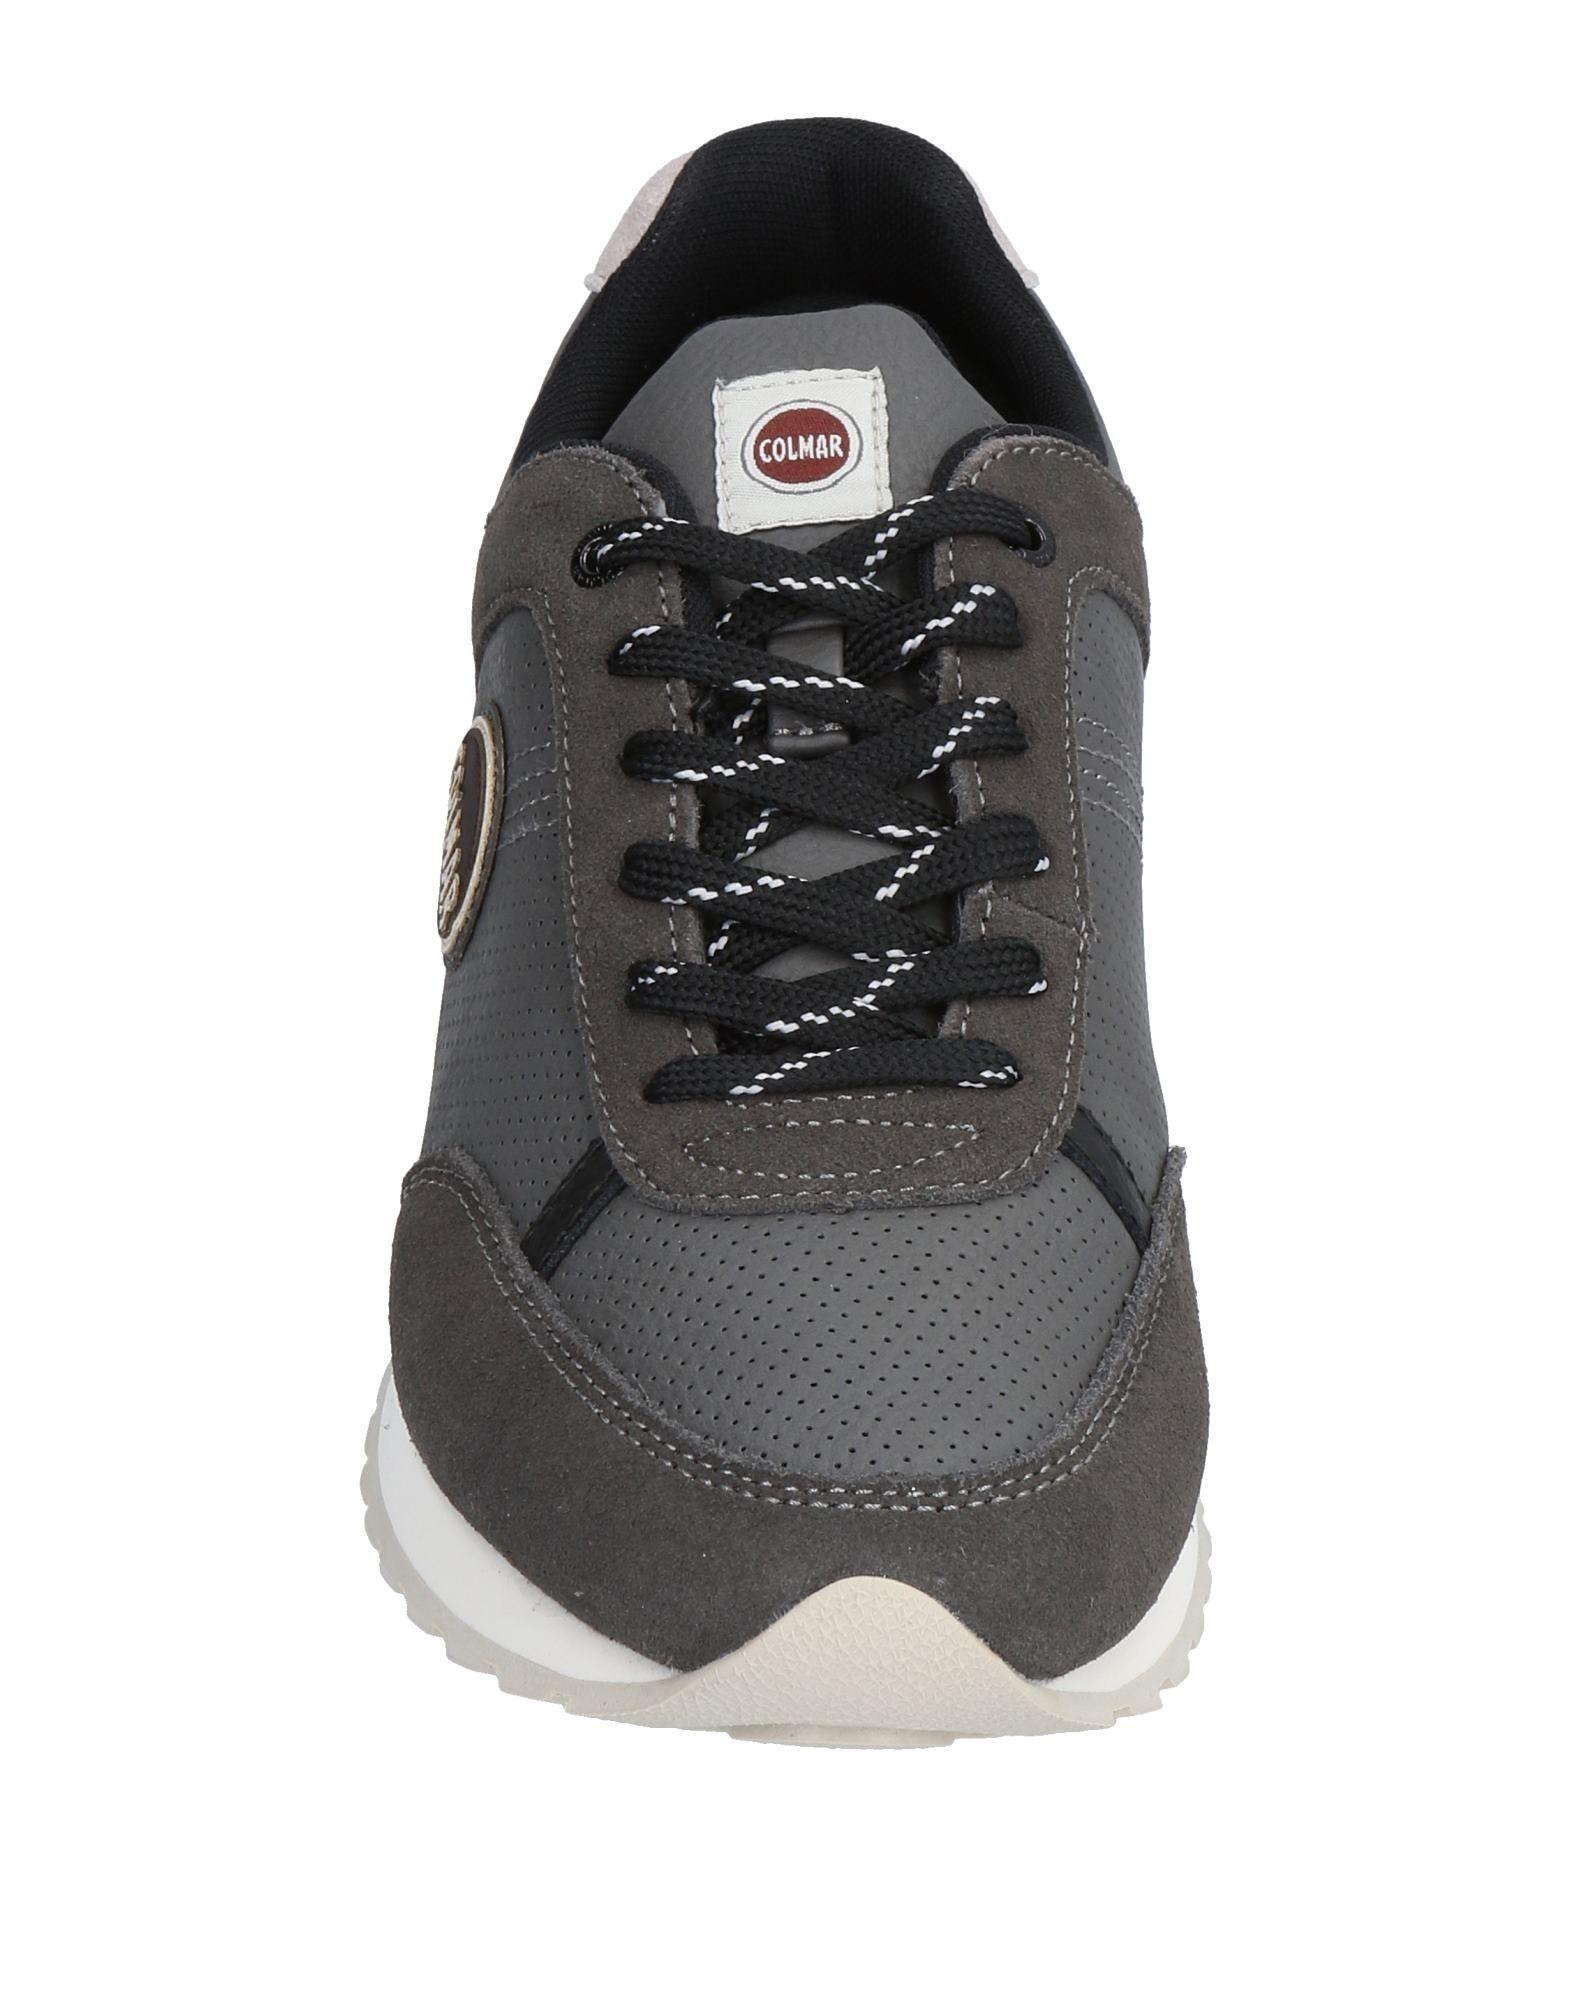 Rabatt echte Schuhe Colmar Sneakers 11467758GV Herren  11467758GV Sneakers e2add1